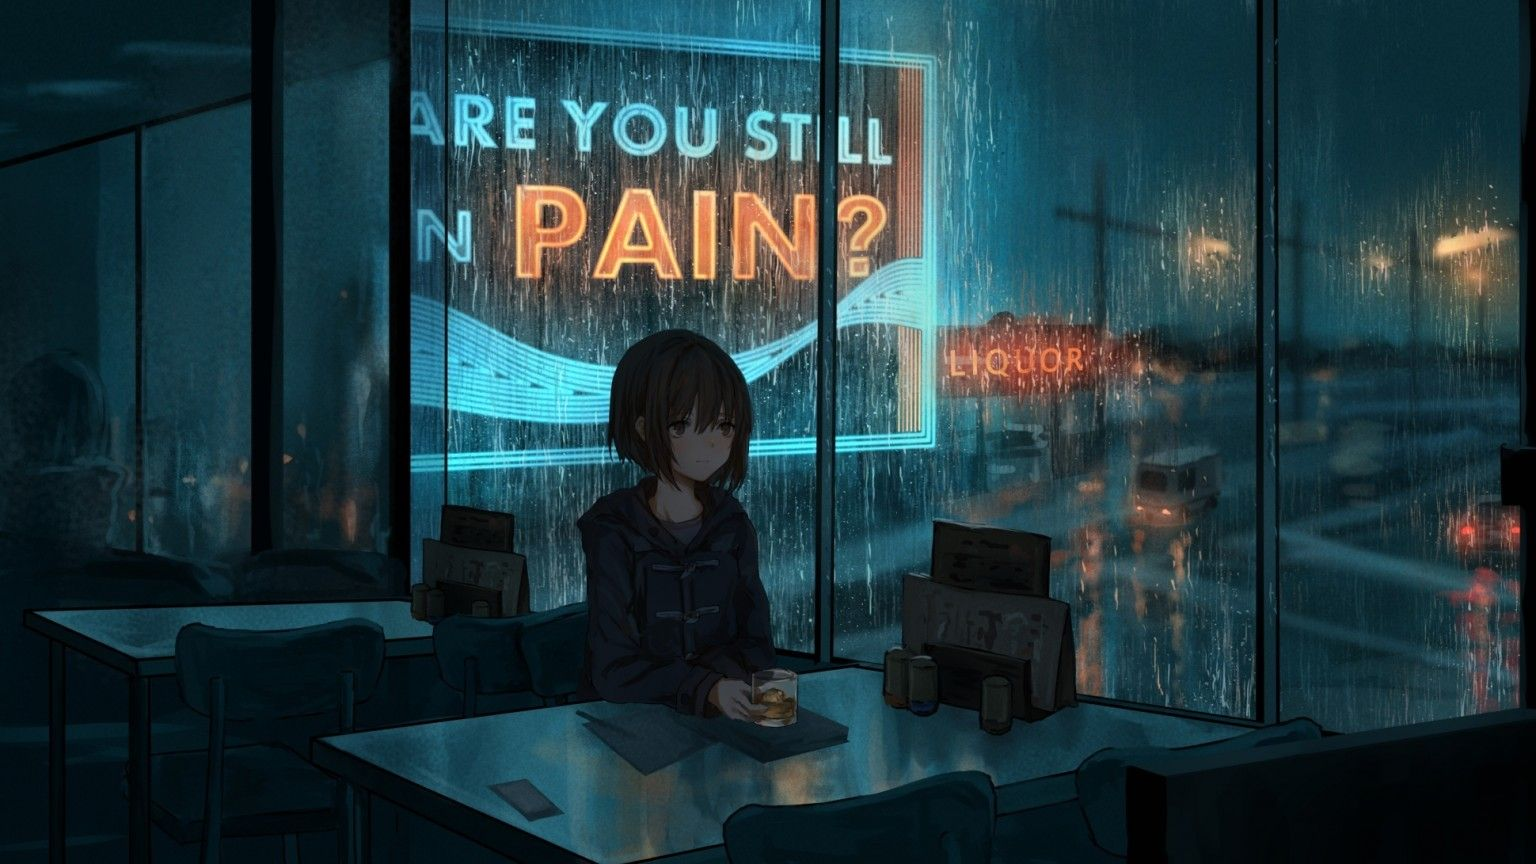 Still in lucid dreaming pain?